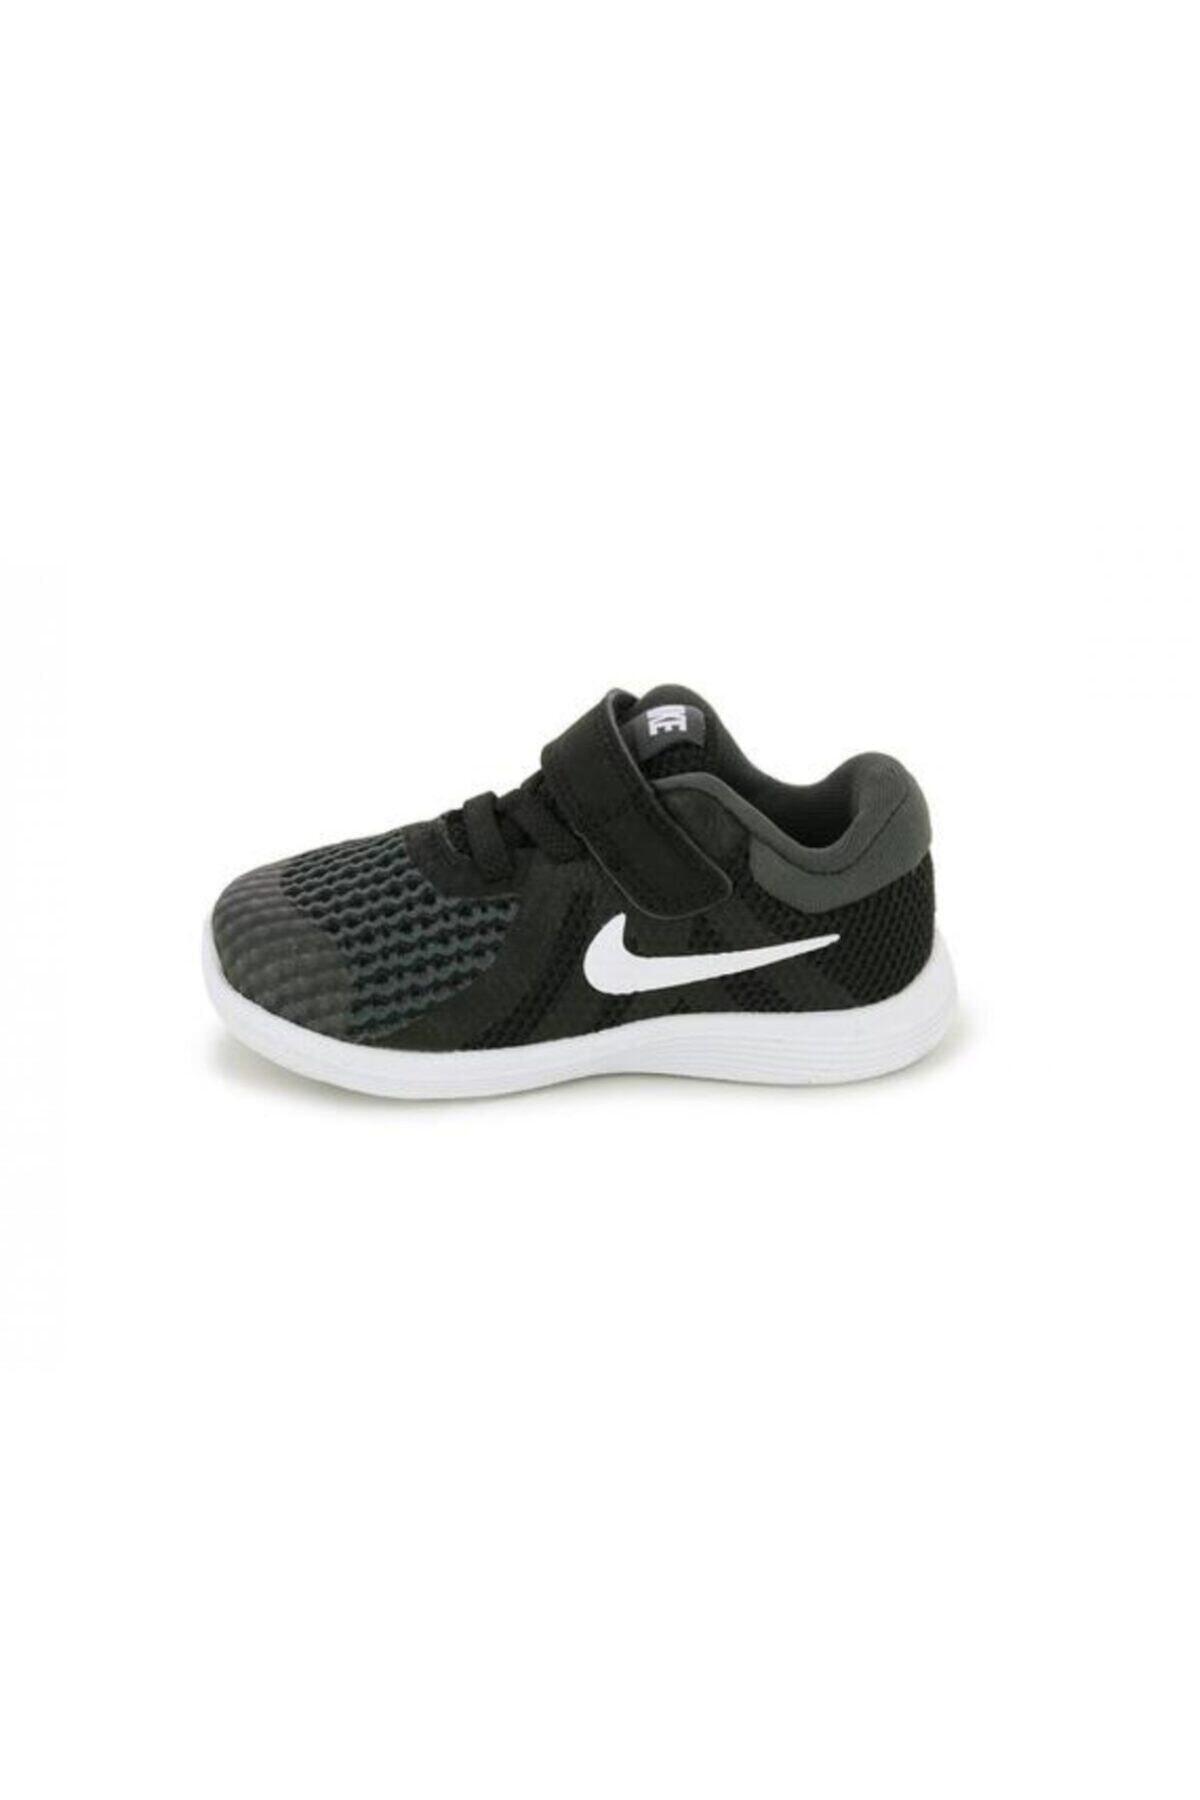 Nike Kids Bebek Siyah Koşu Ayakkabı 943304-006 1